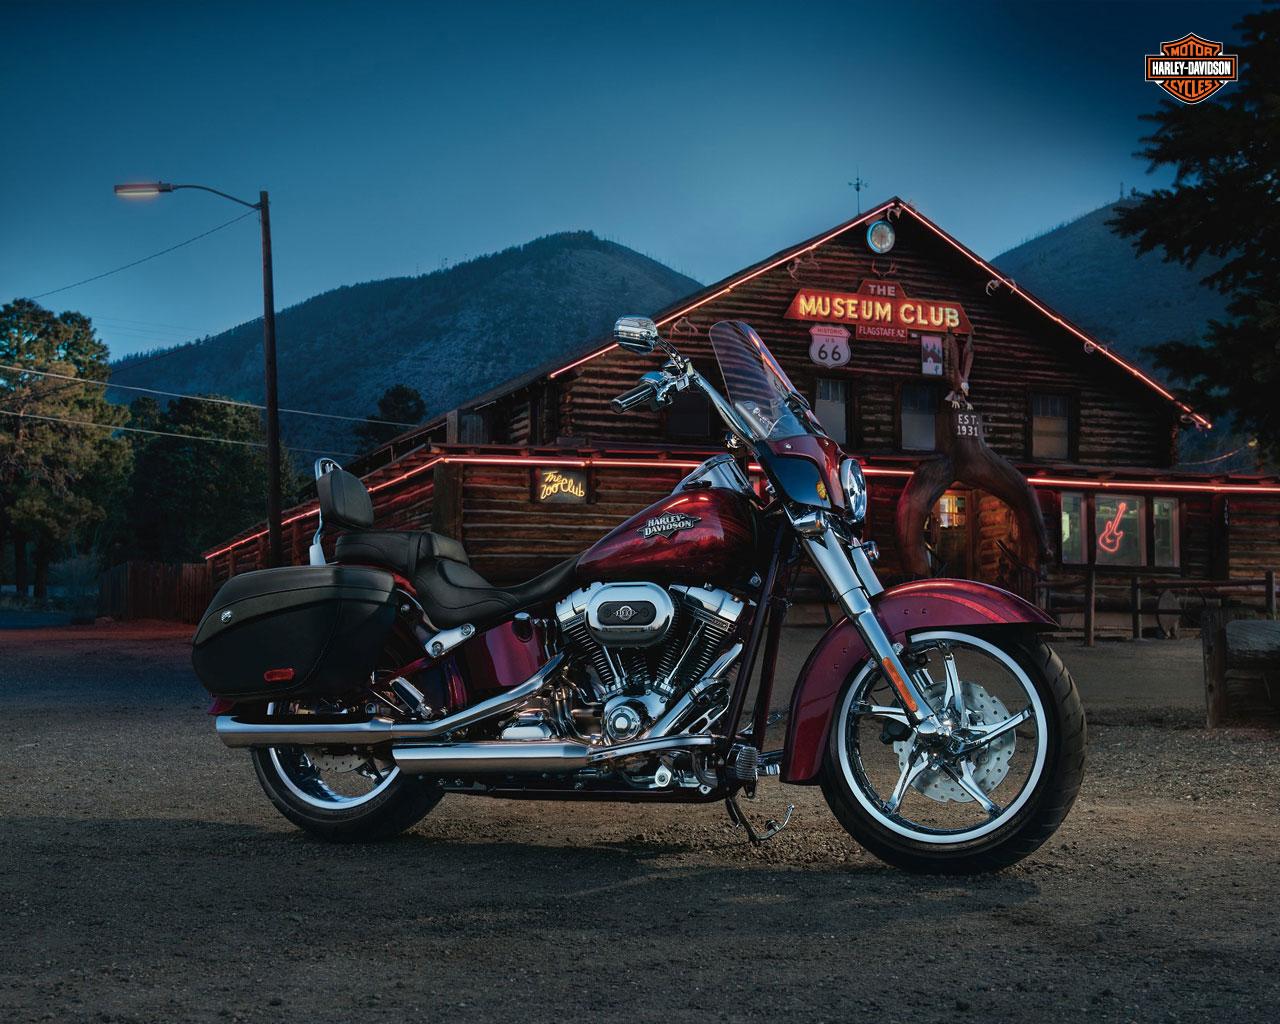 HARLEY DAVIDSON   Motorcycles Wallpaper 32041350 1280x1024